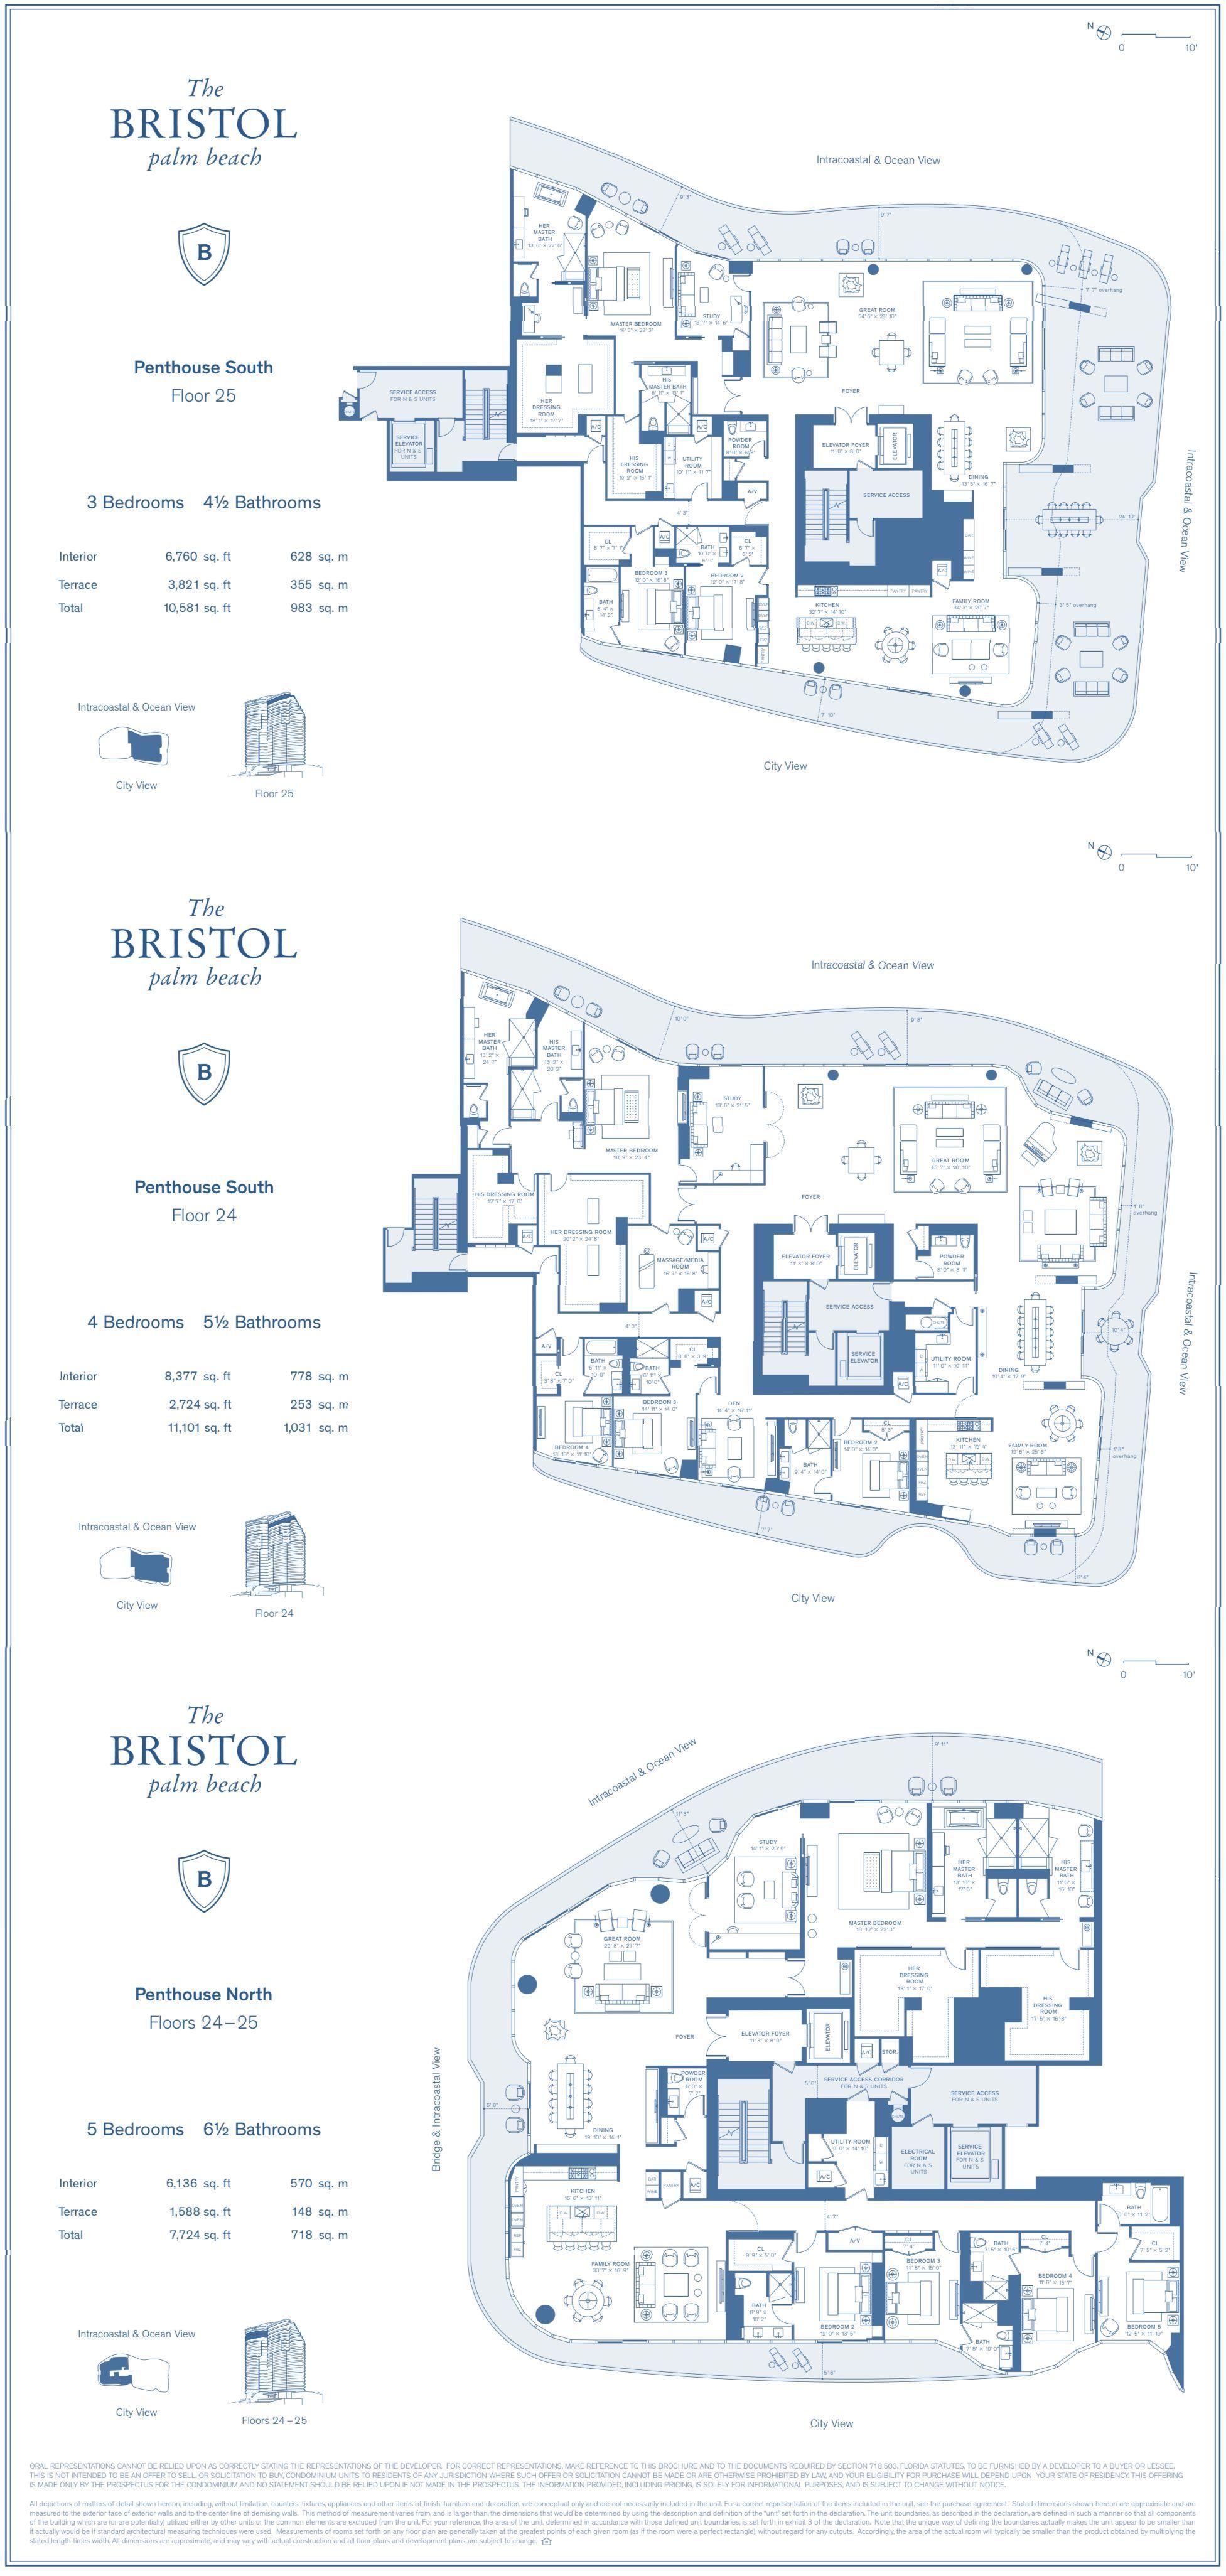 The Bristol Palm Beach Waterfront Condominium Residences Condominium Palm Beach Living Palm Beach